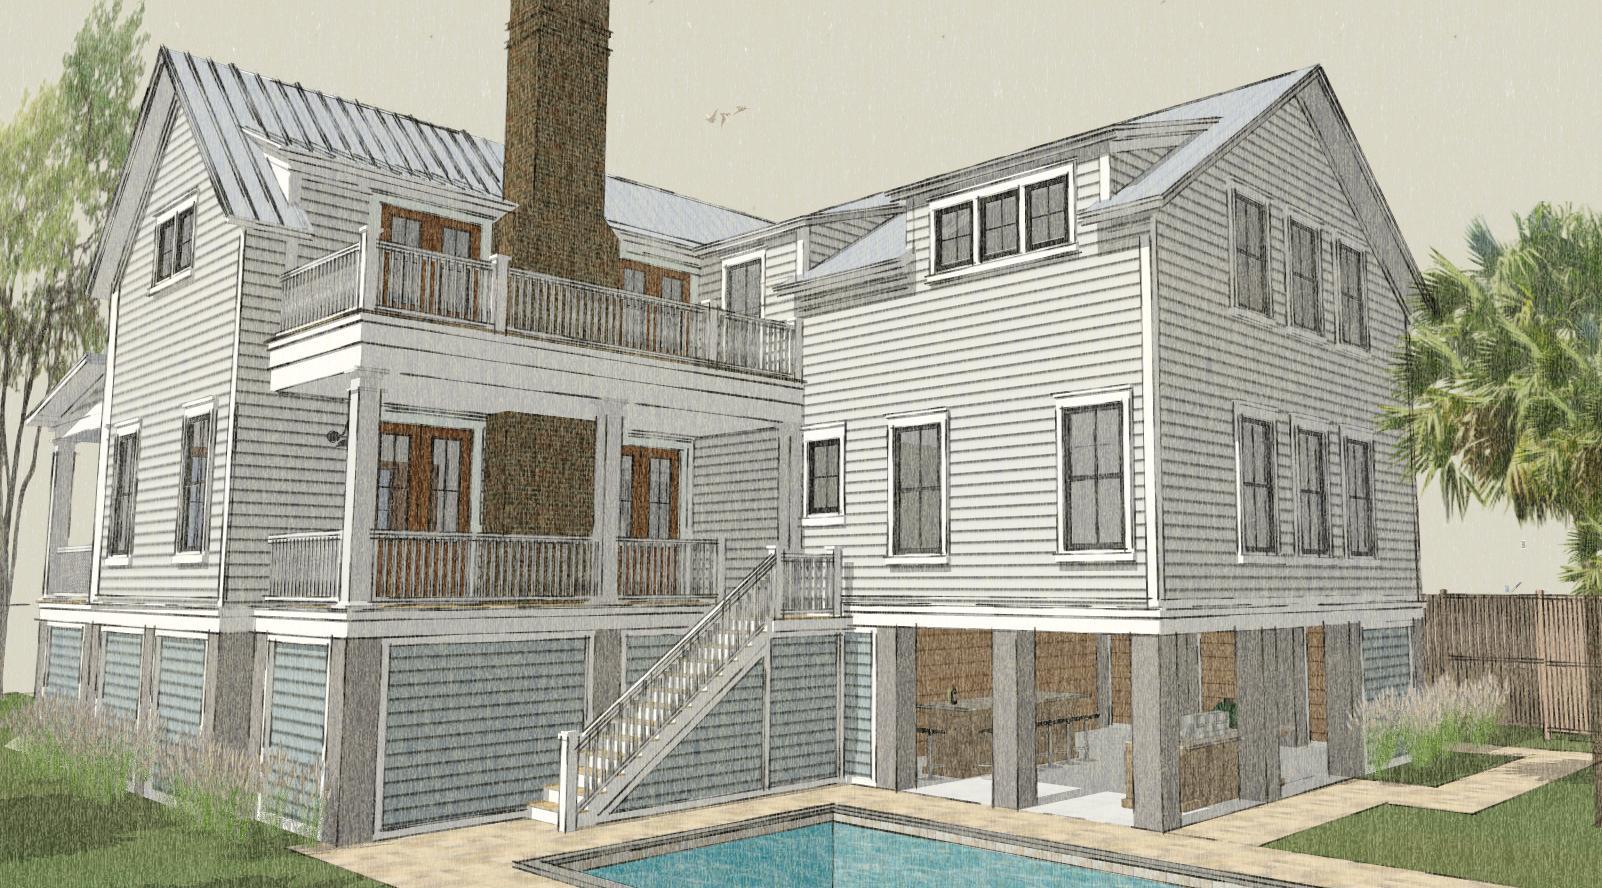 Sullivans Island Homes For Sale - 1612 Atlantic Avenue, Sullivans Island, SC - 0